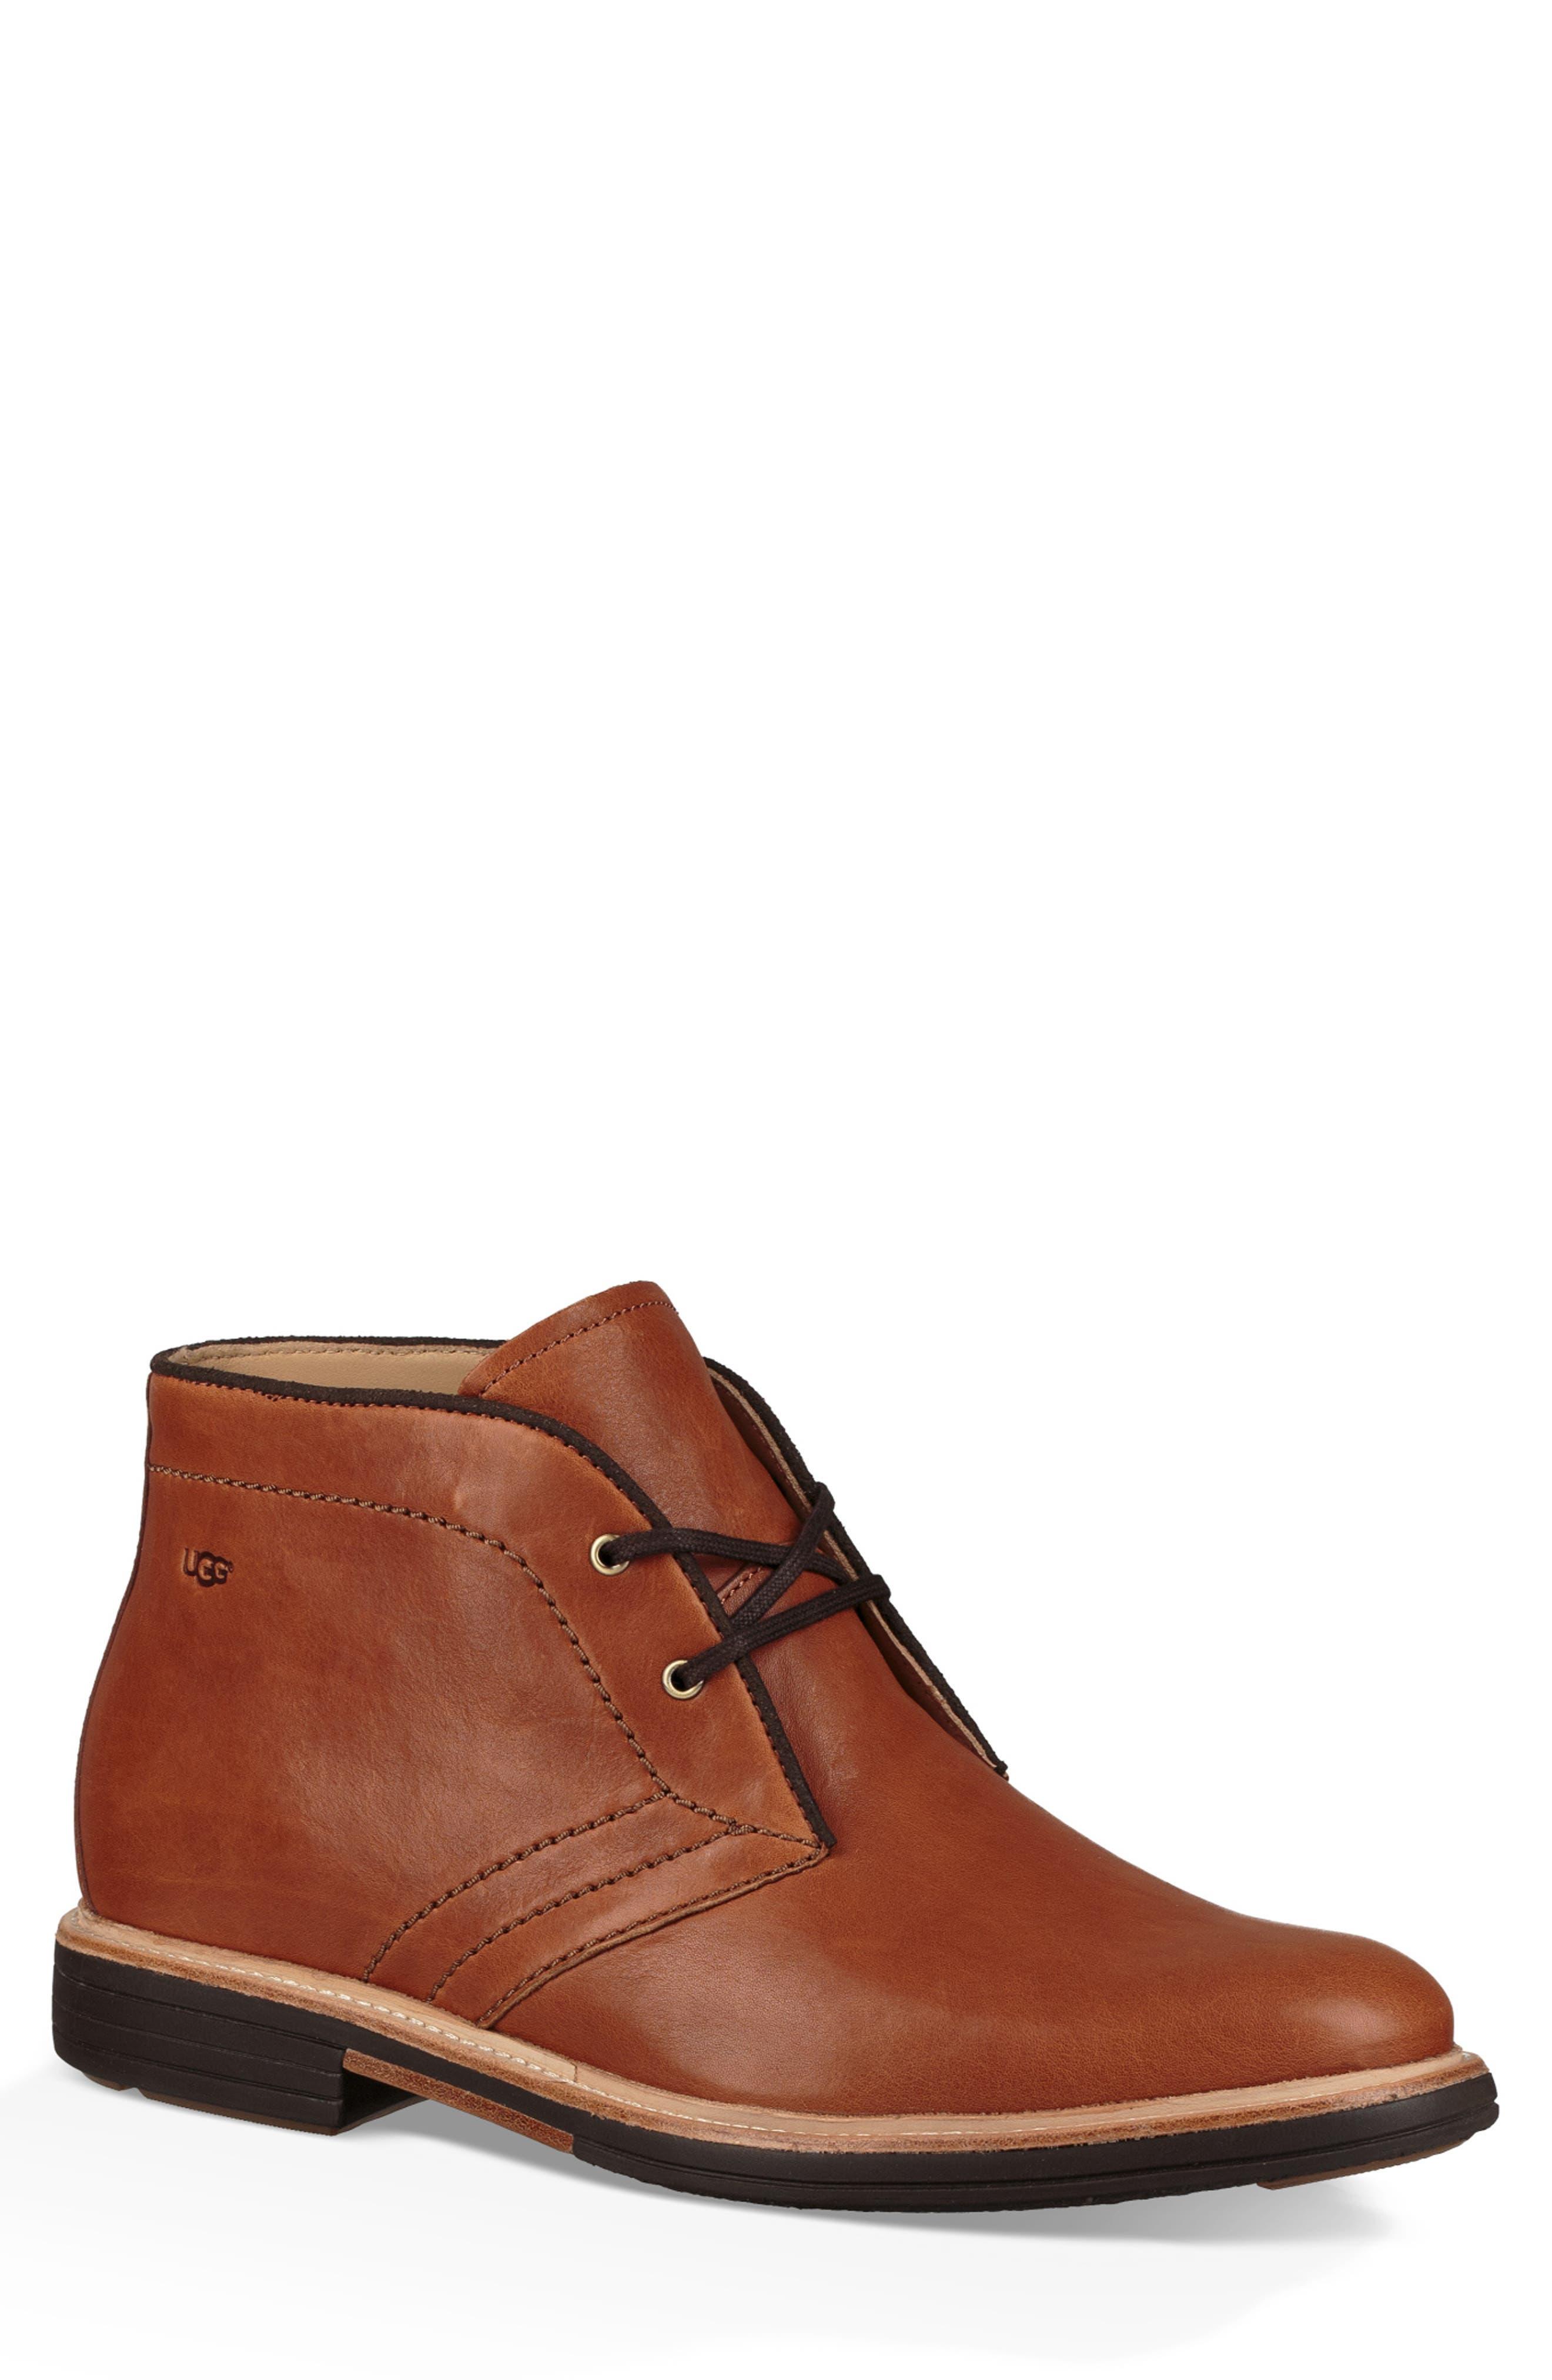 Australia Dagmann Chukka Boot,                         Main,                         color, TAN